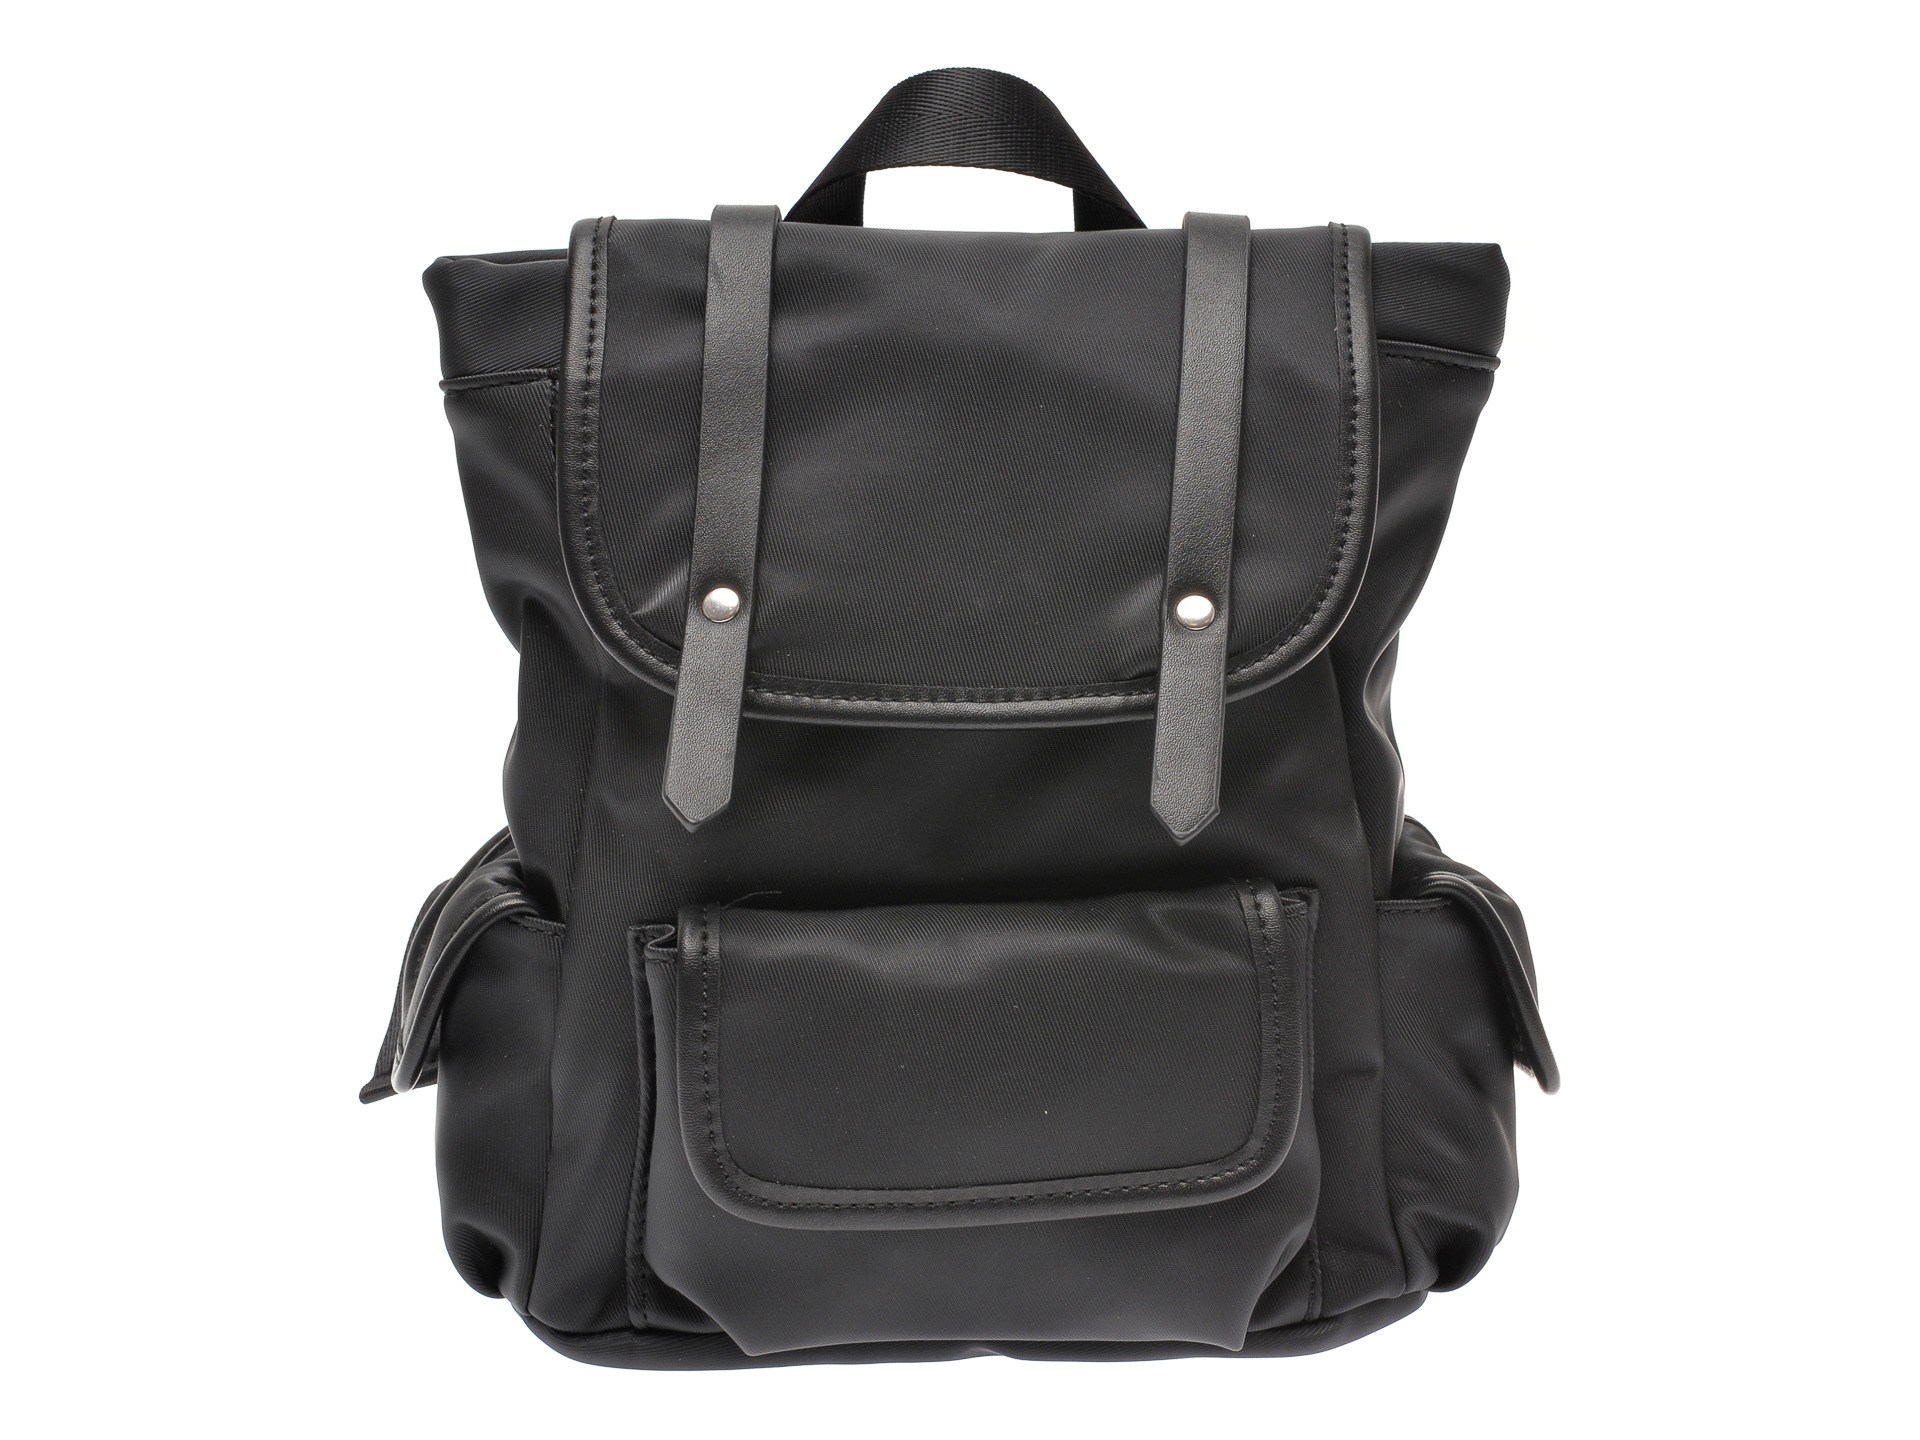 Rucsac CALL IT SPRING negru, LION001, din material textil New